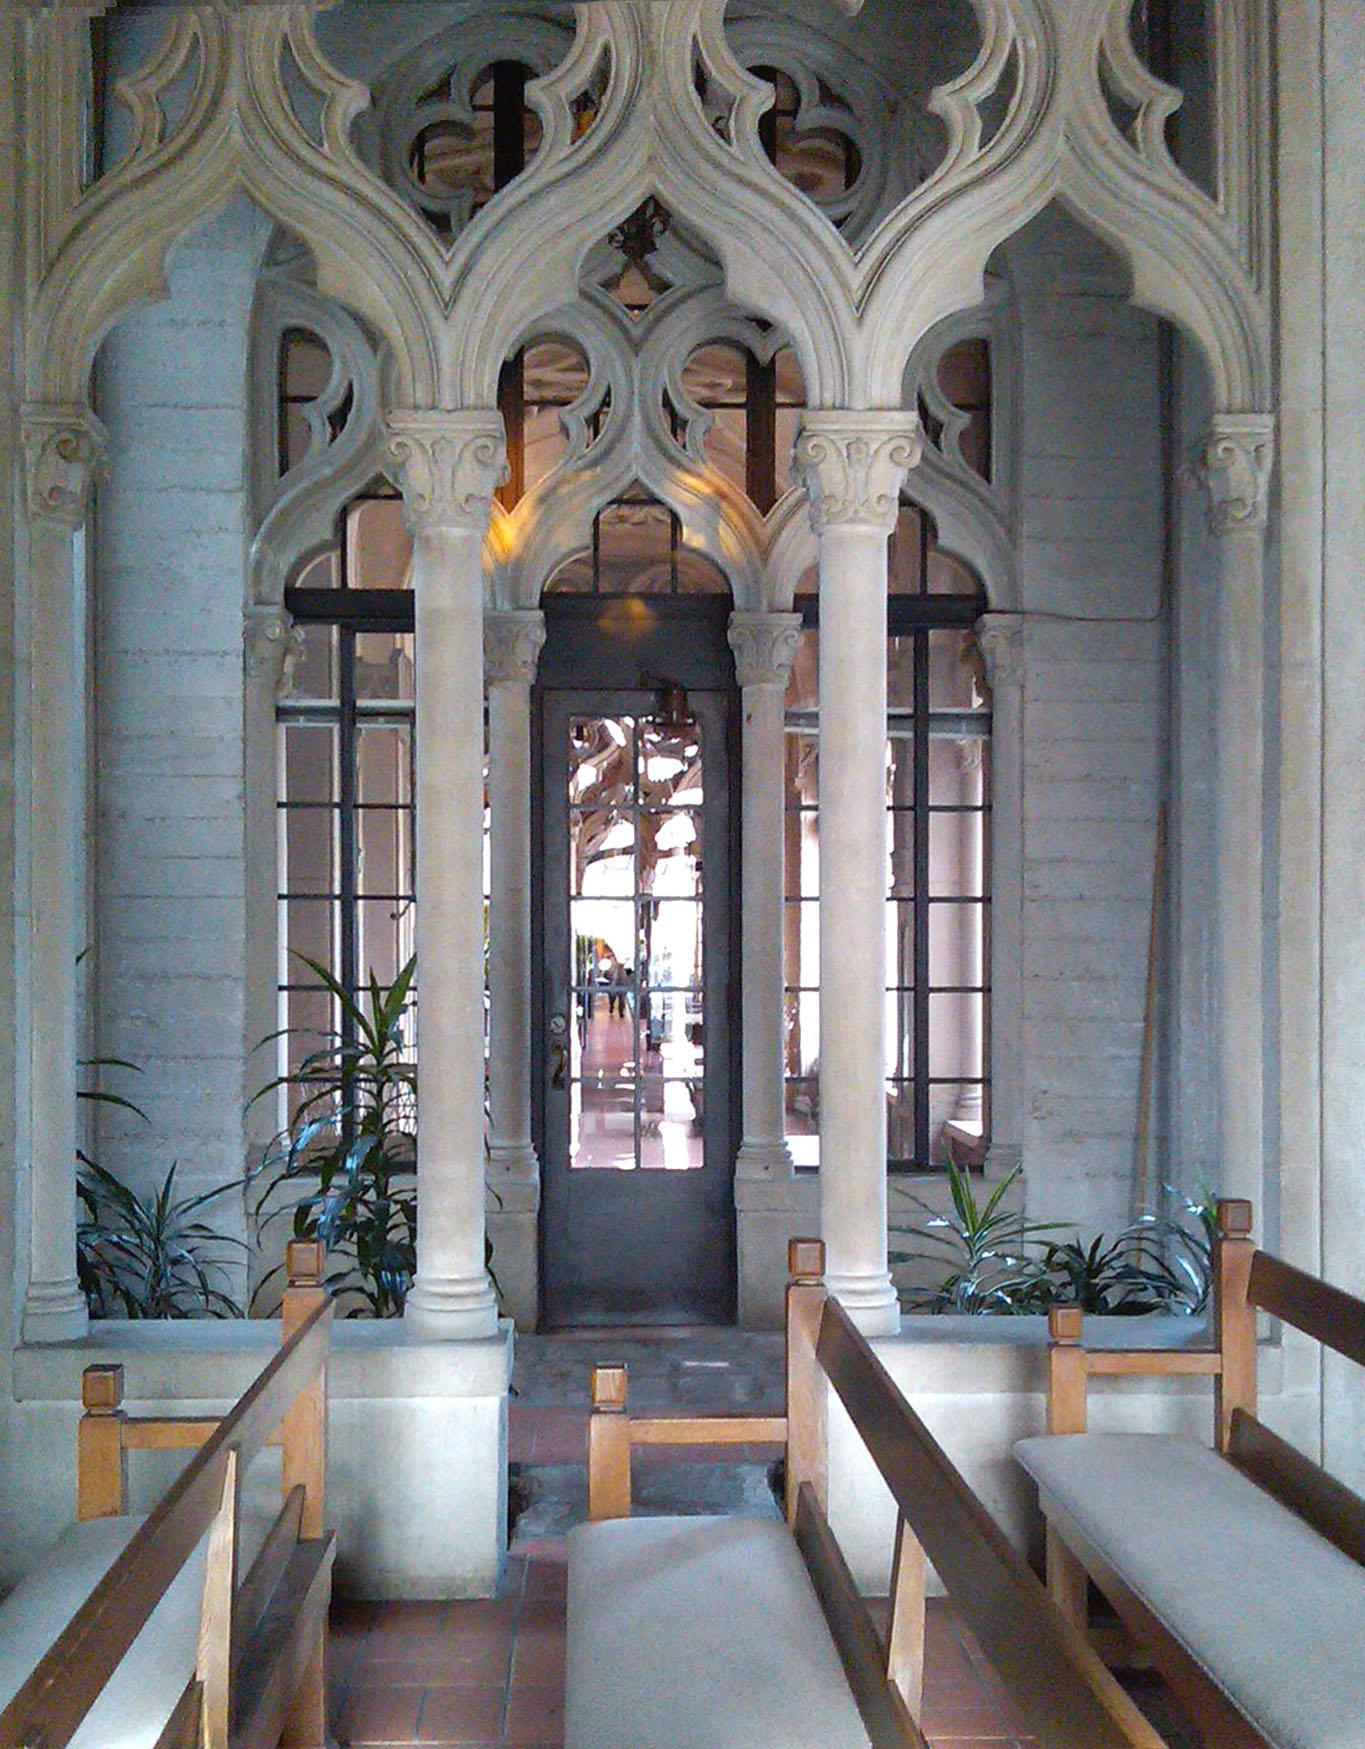 Chapel of Chimes interior 2.jpg